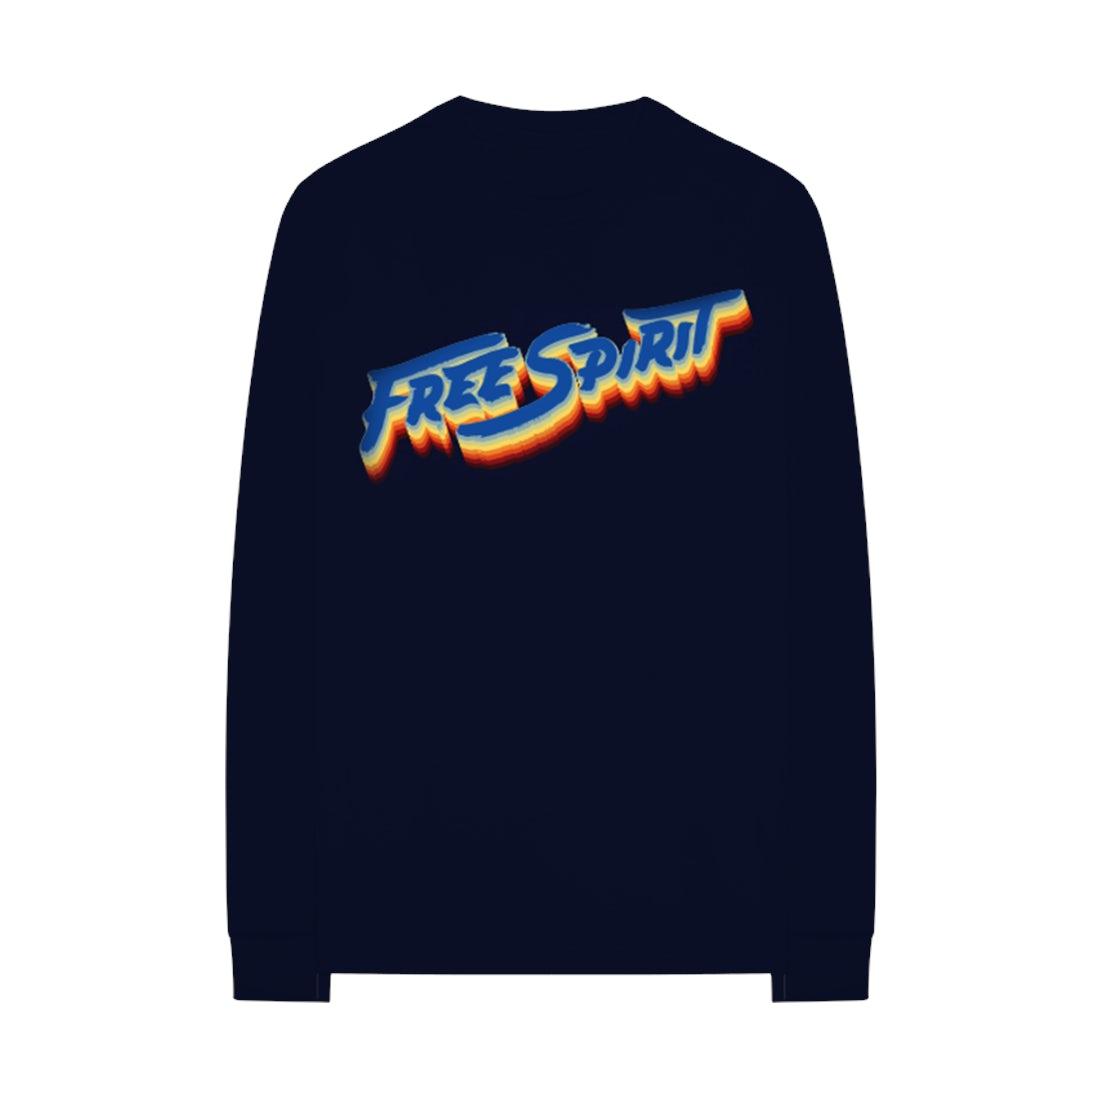 Alligatoah Hoody Logo 2 Grau Sport-kapuzenpullis & -sweatshirts Fanartikel & Merchandise